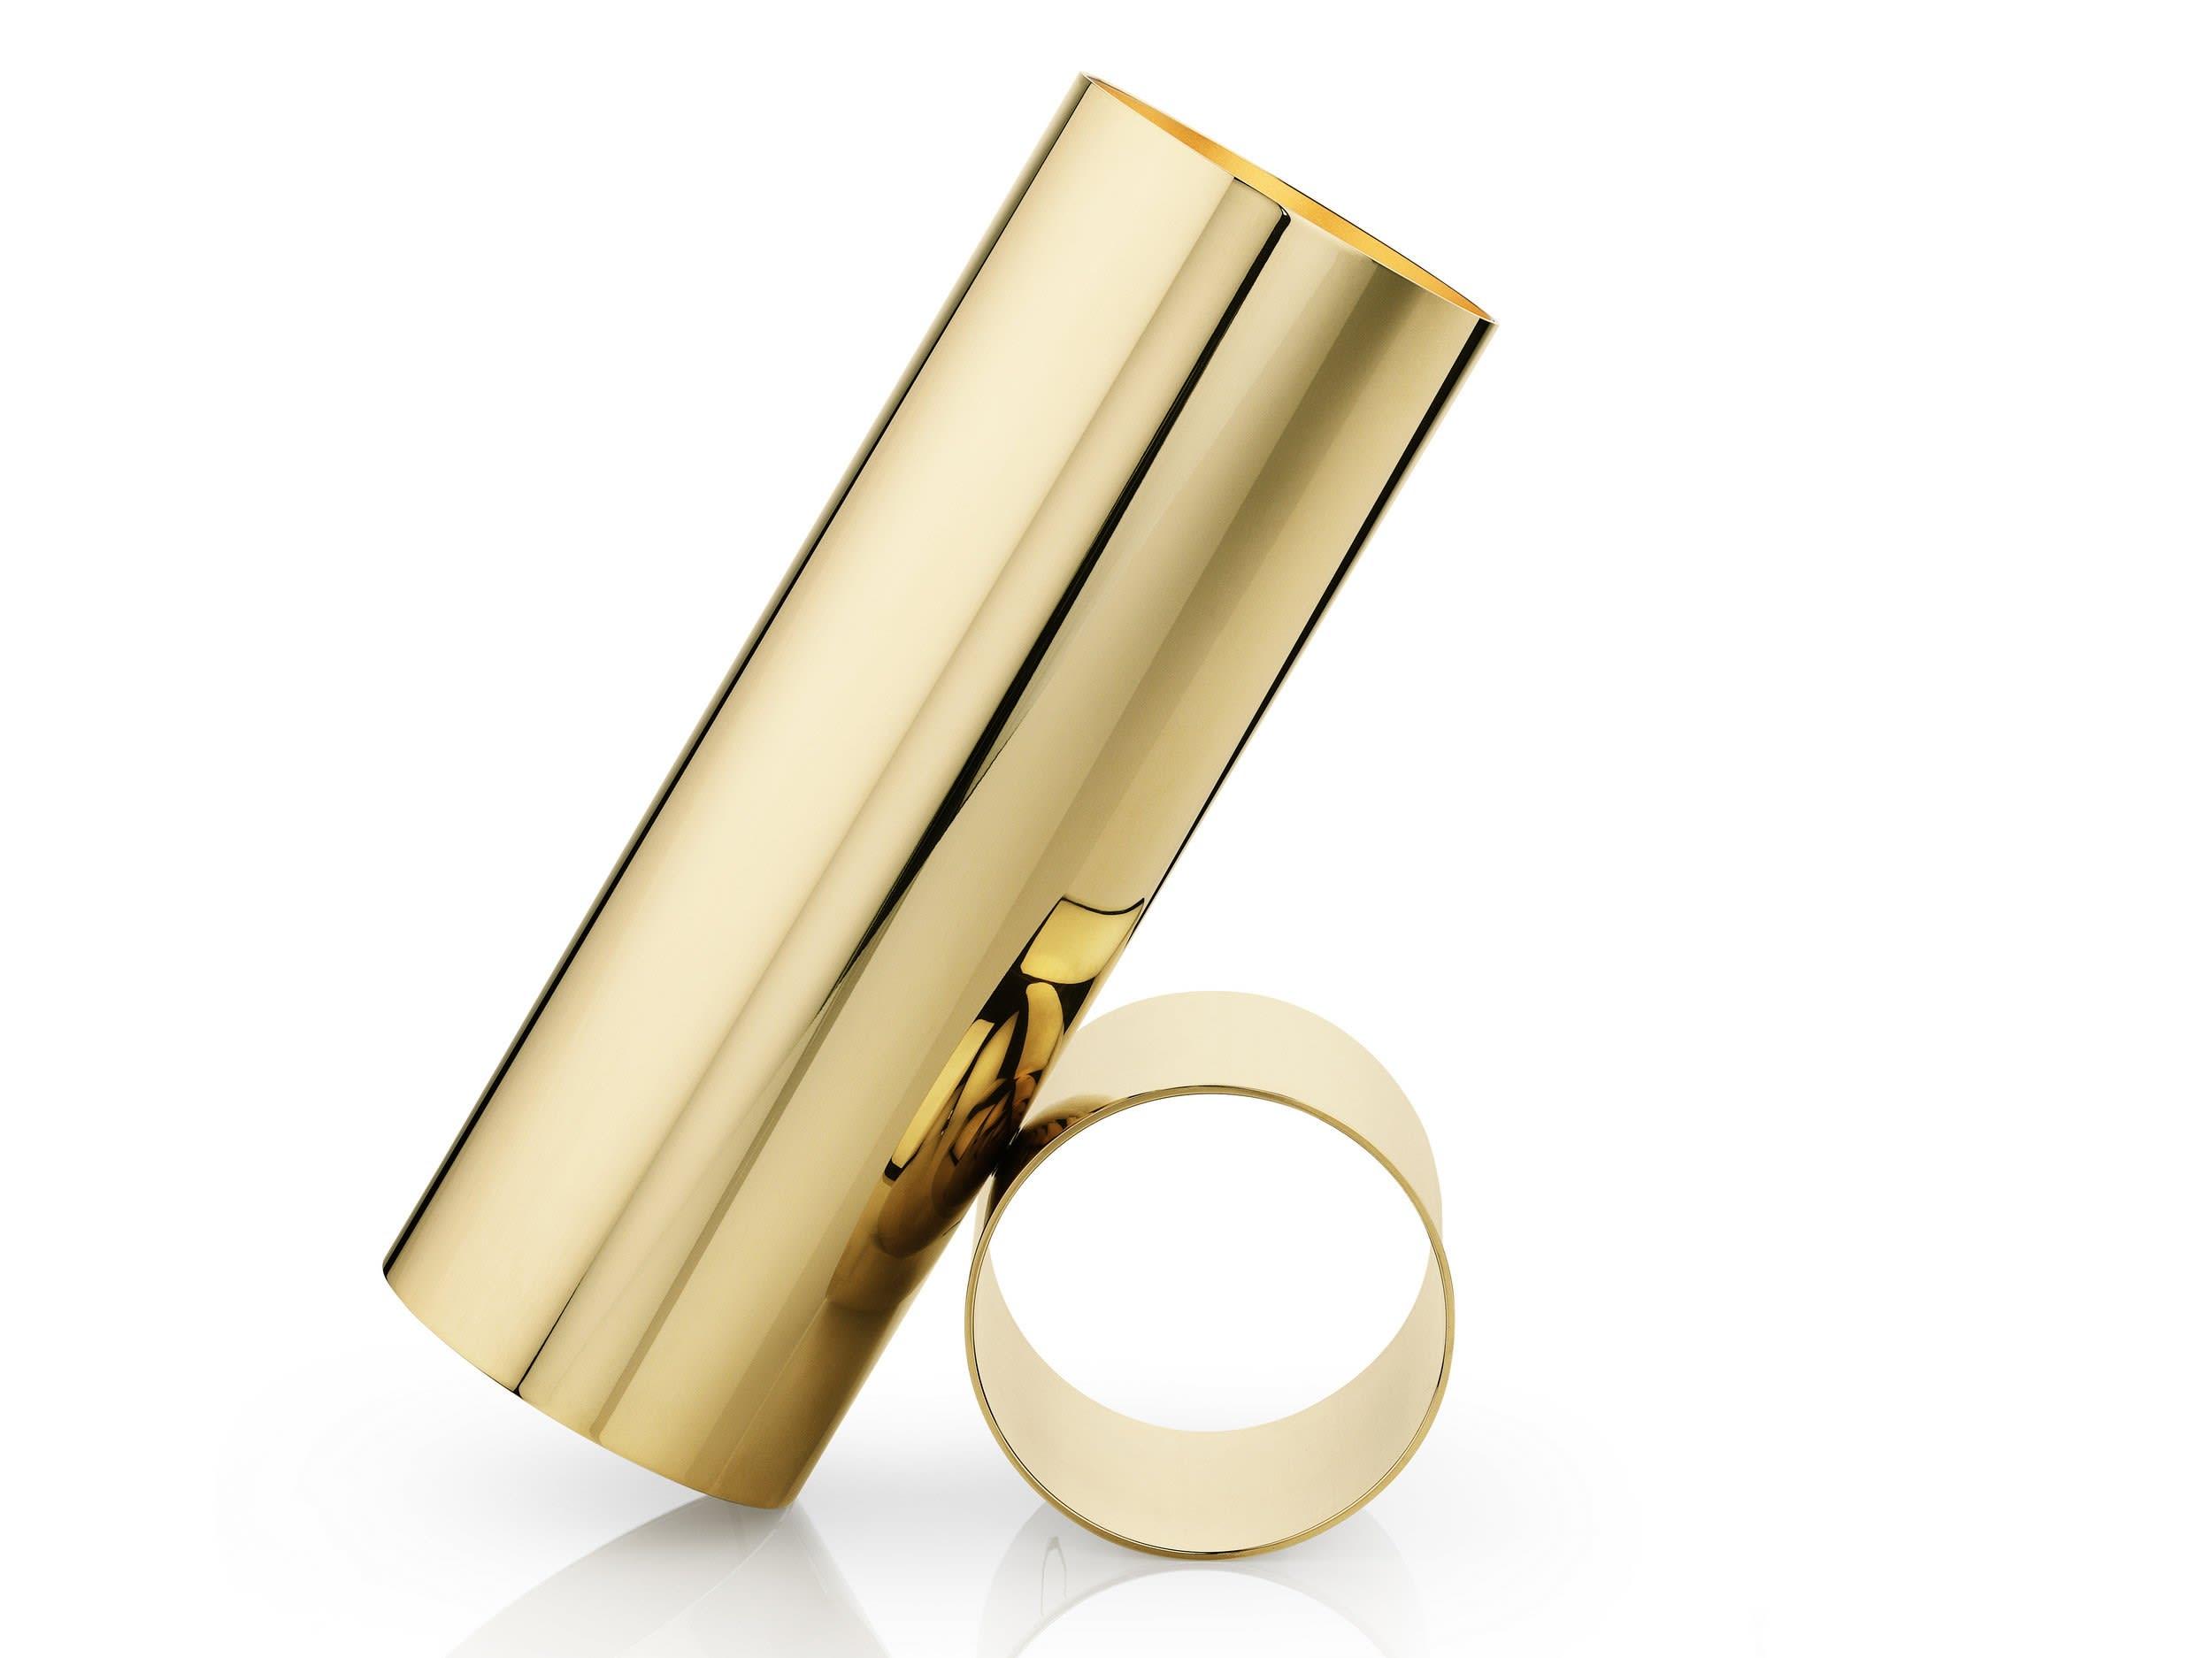 gold - +$240.38